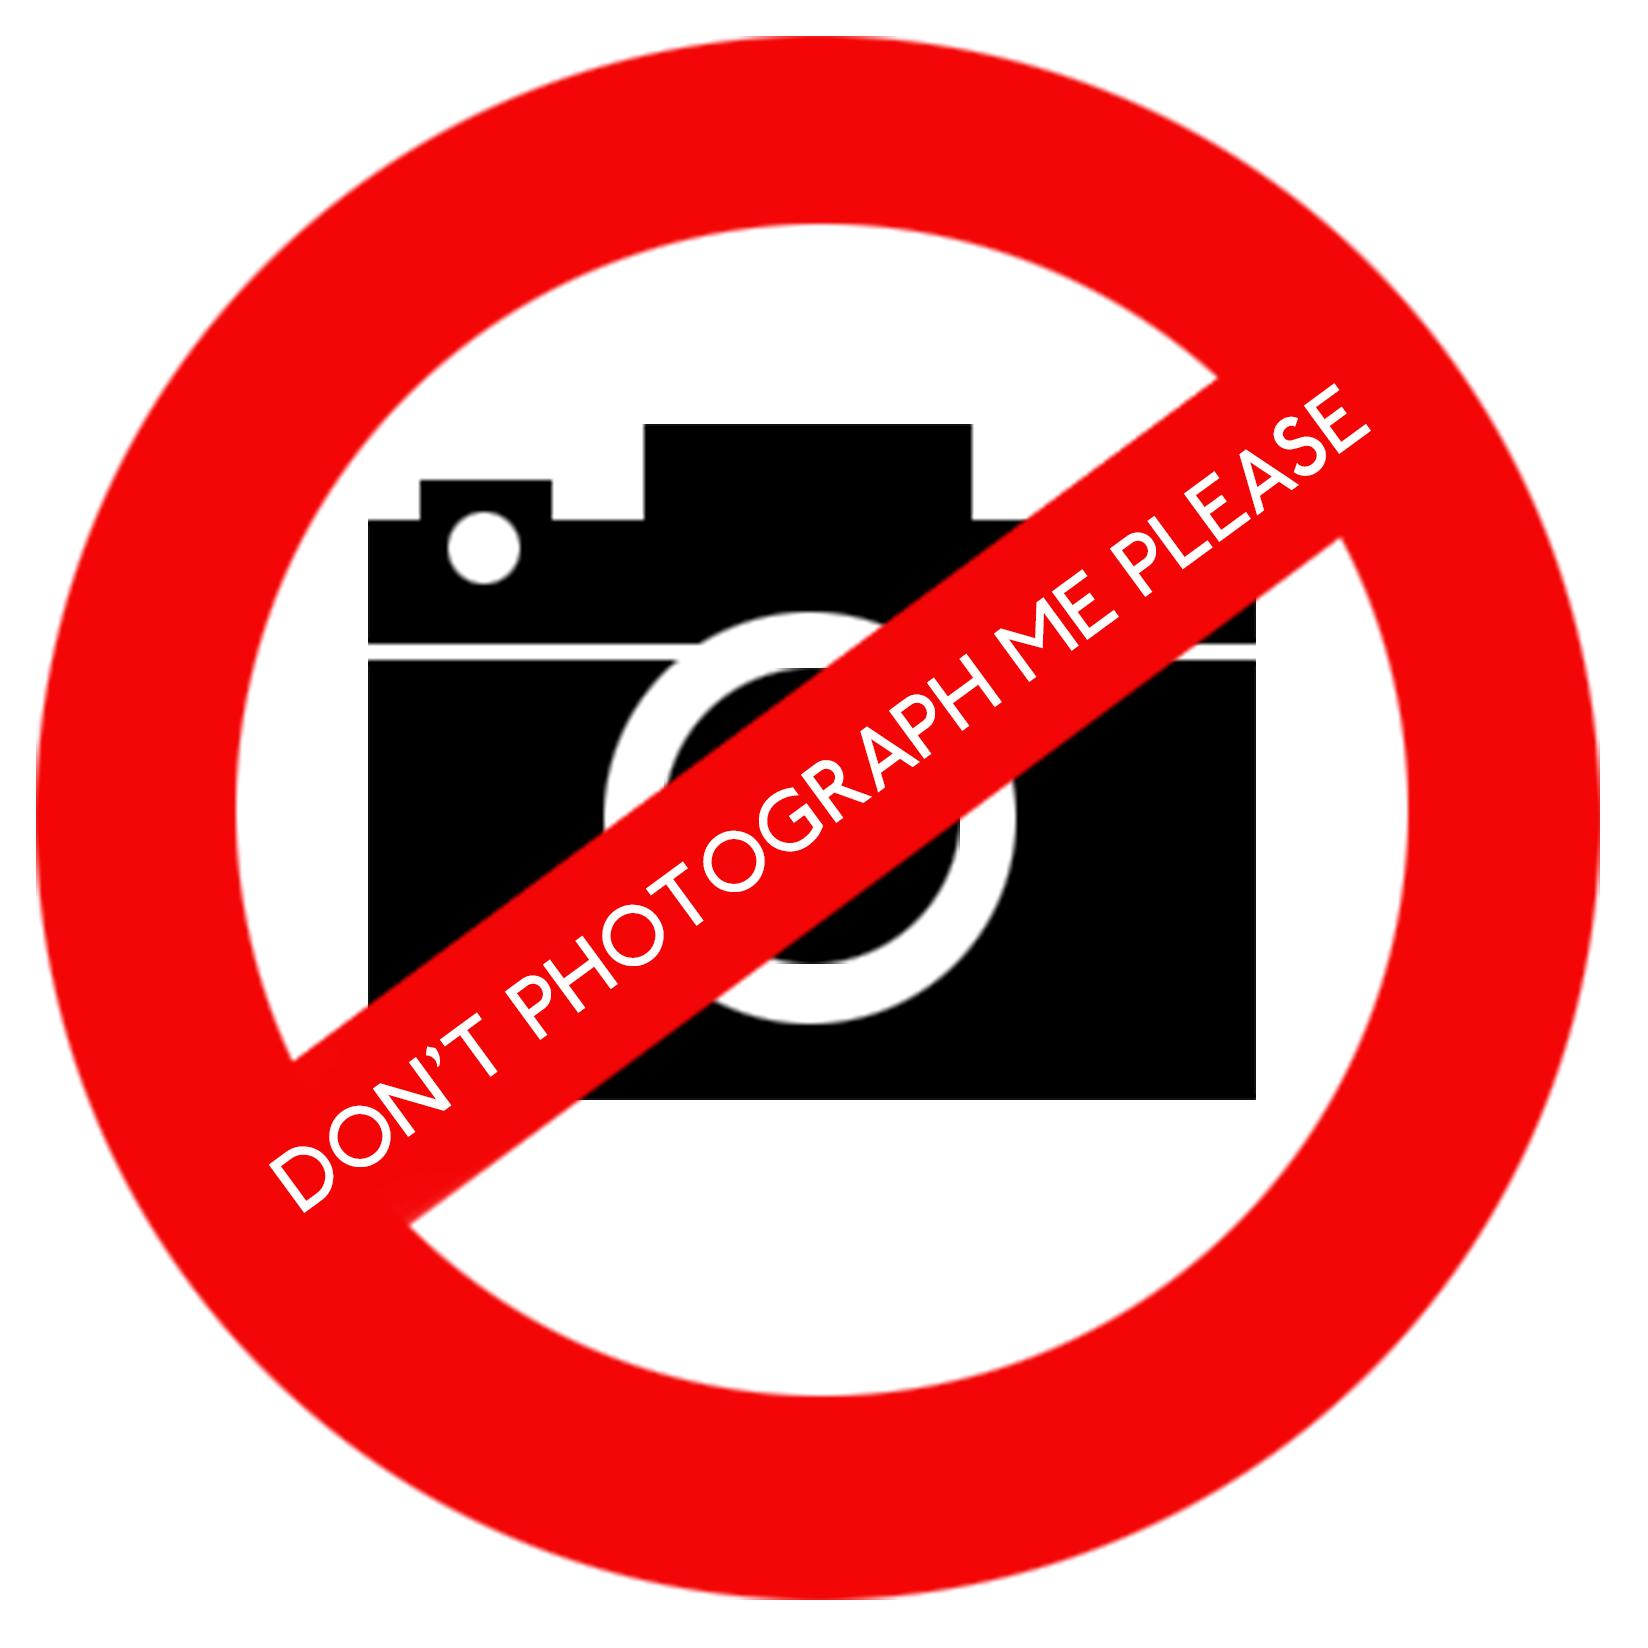 Wikimania_2014_No_photos_name_badge_sticker.jpg